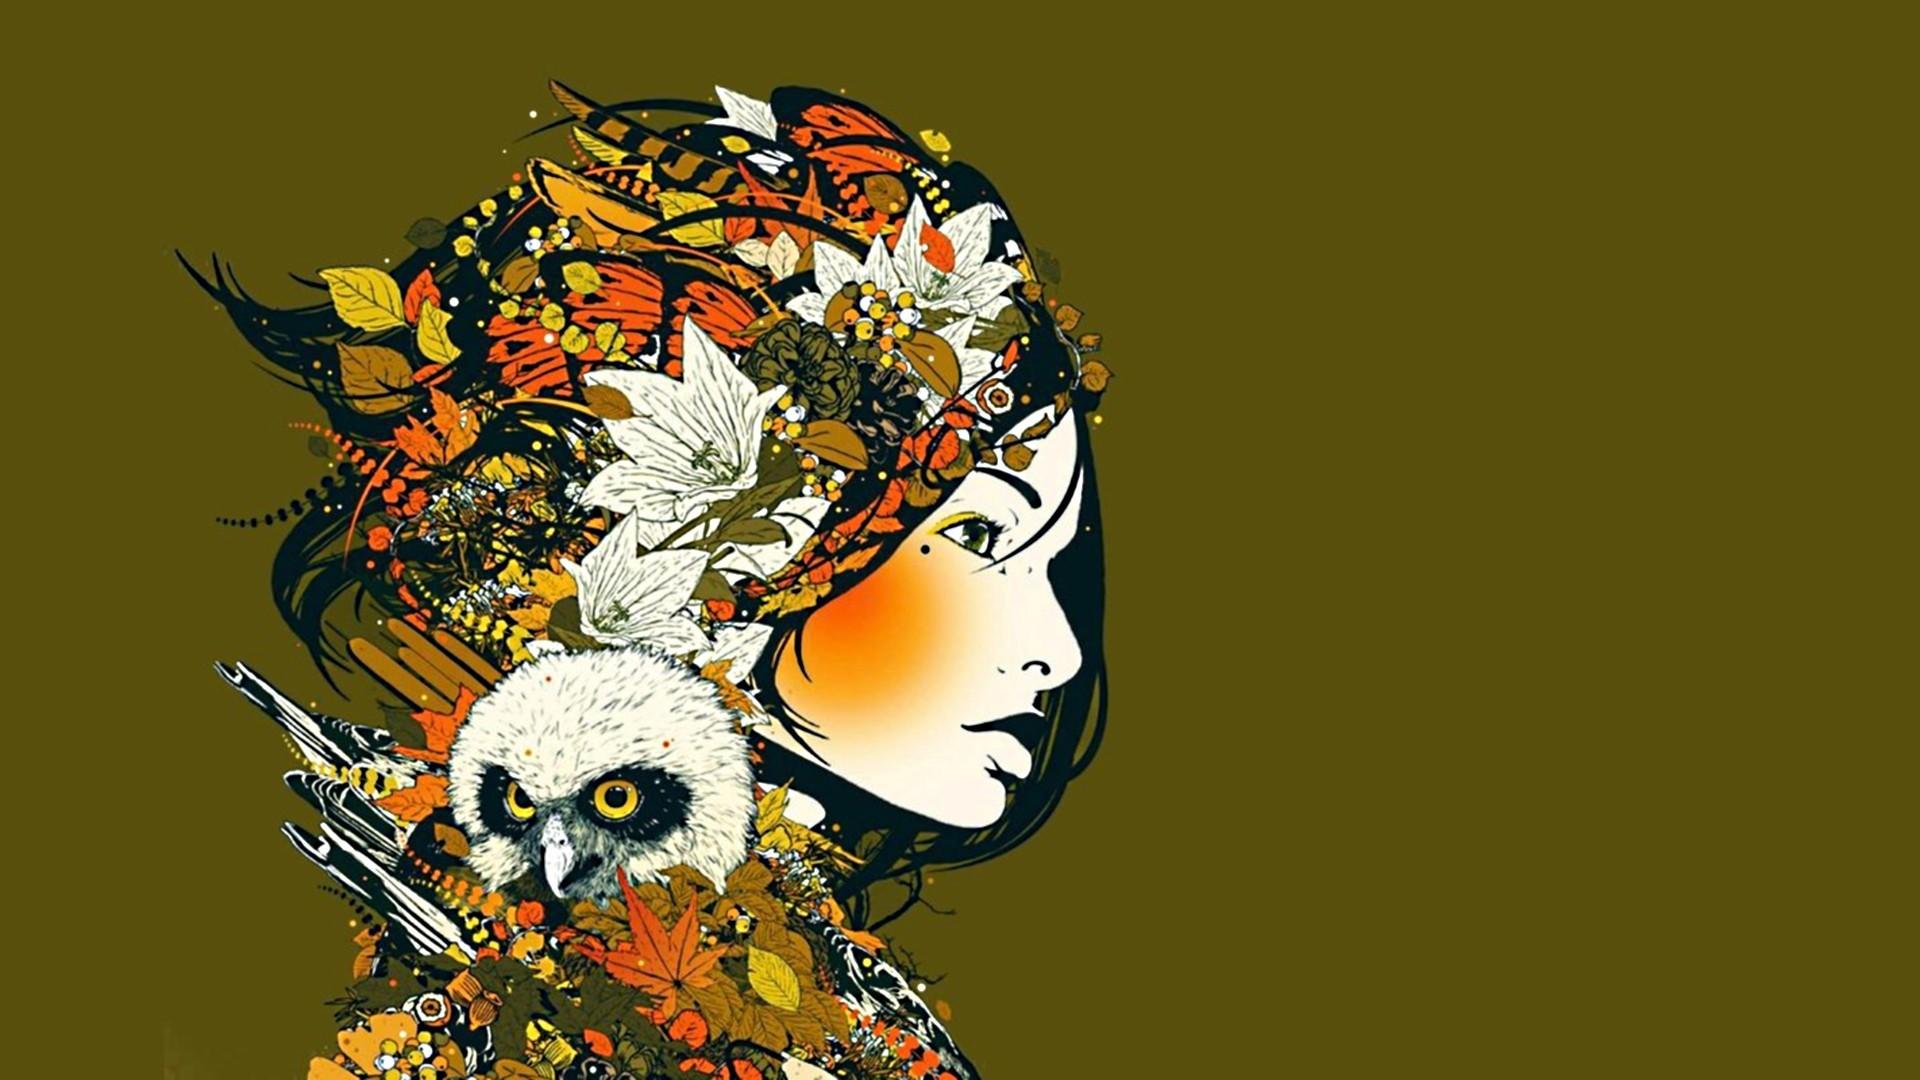 Album Cover Art Wallpaper 65 Images